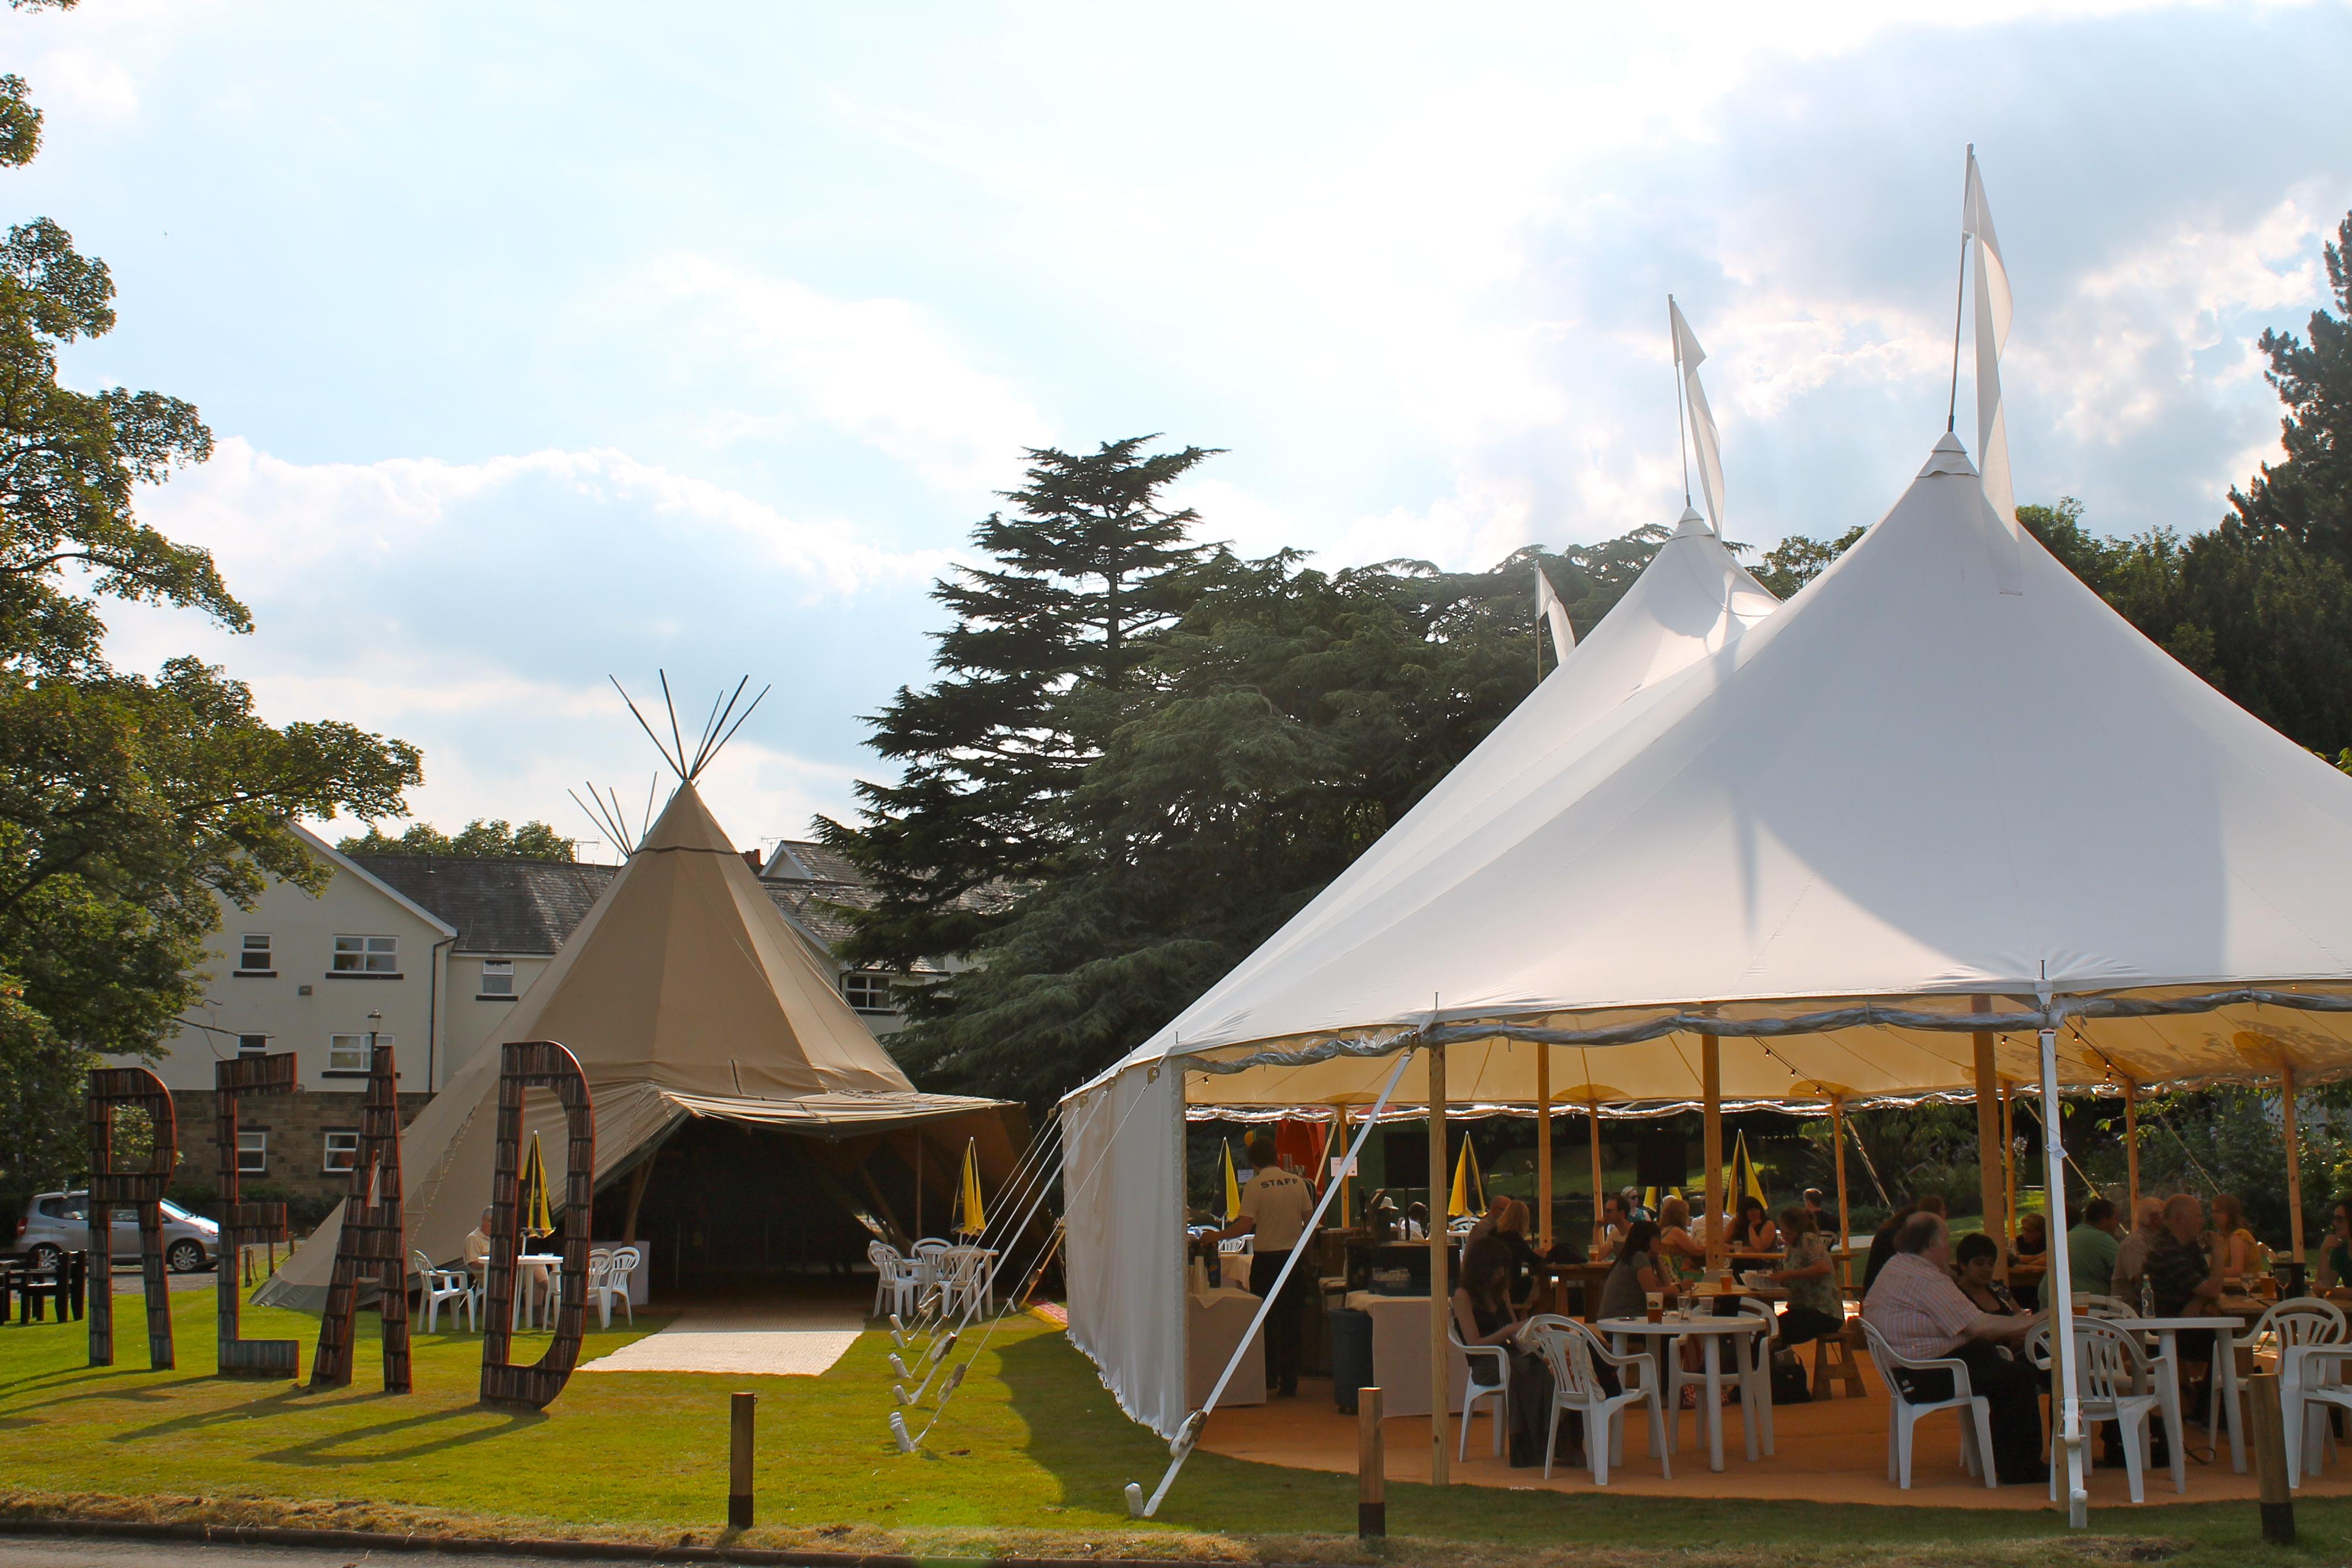 PapaKåta Teepee & Sperry Tent at Crime Writers Festival